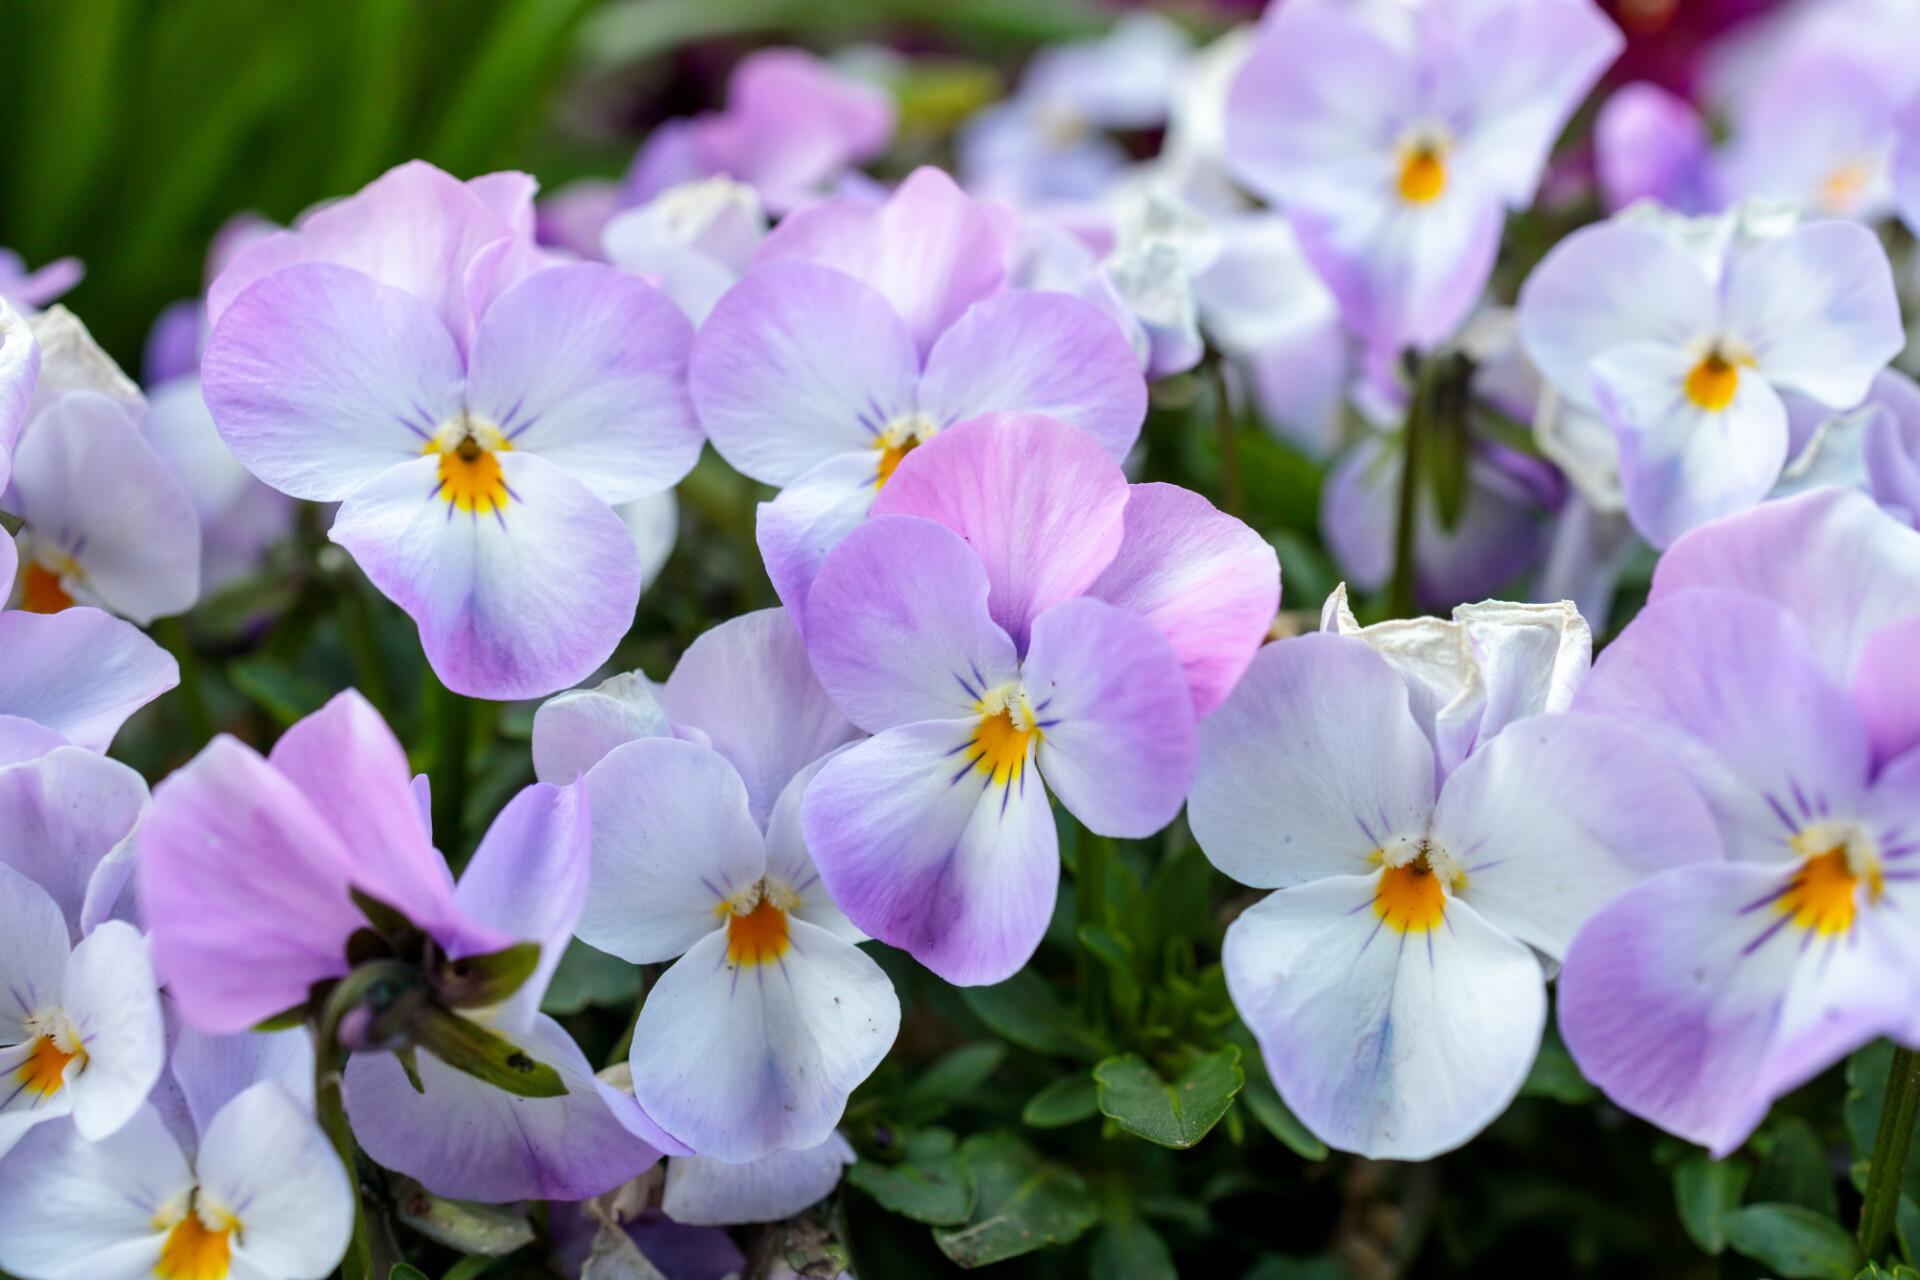 Bright purple viola flowers